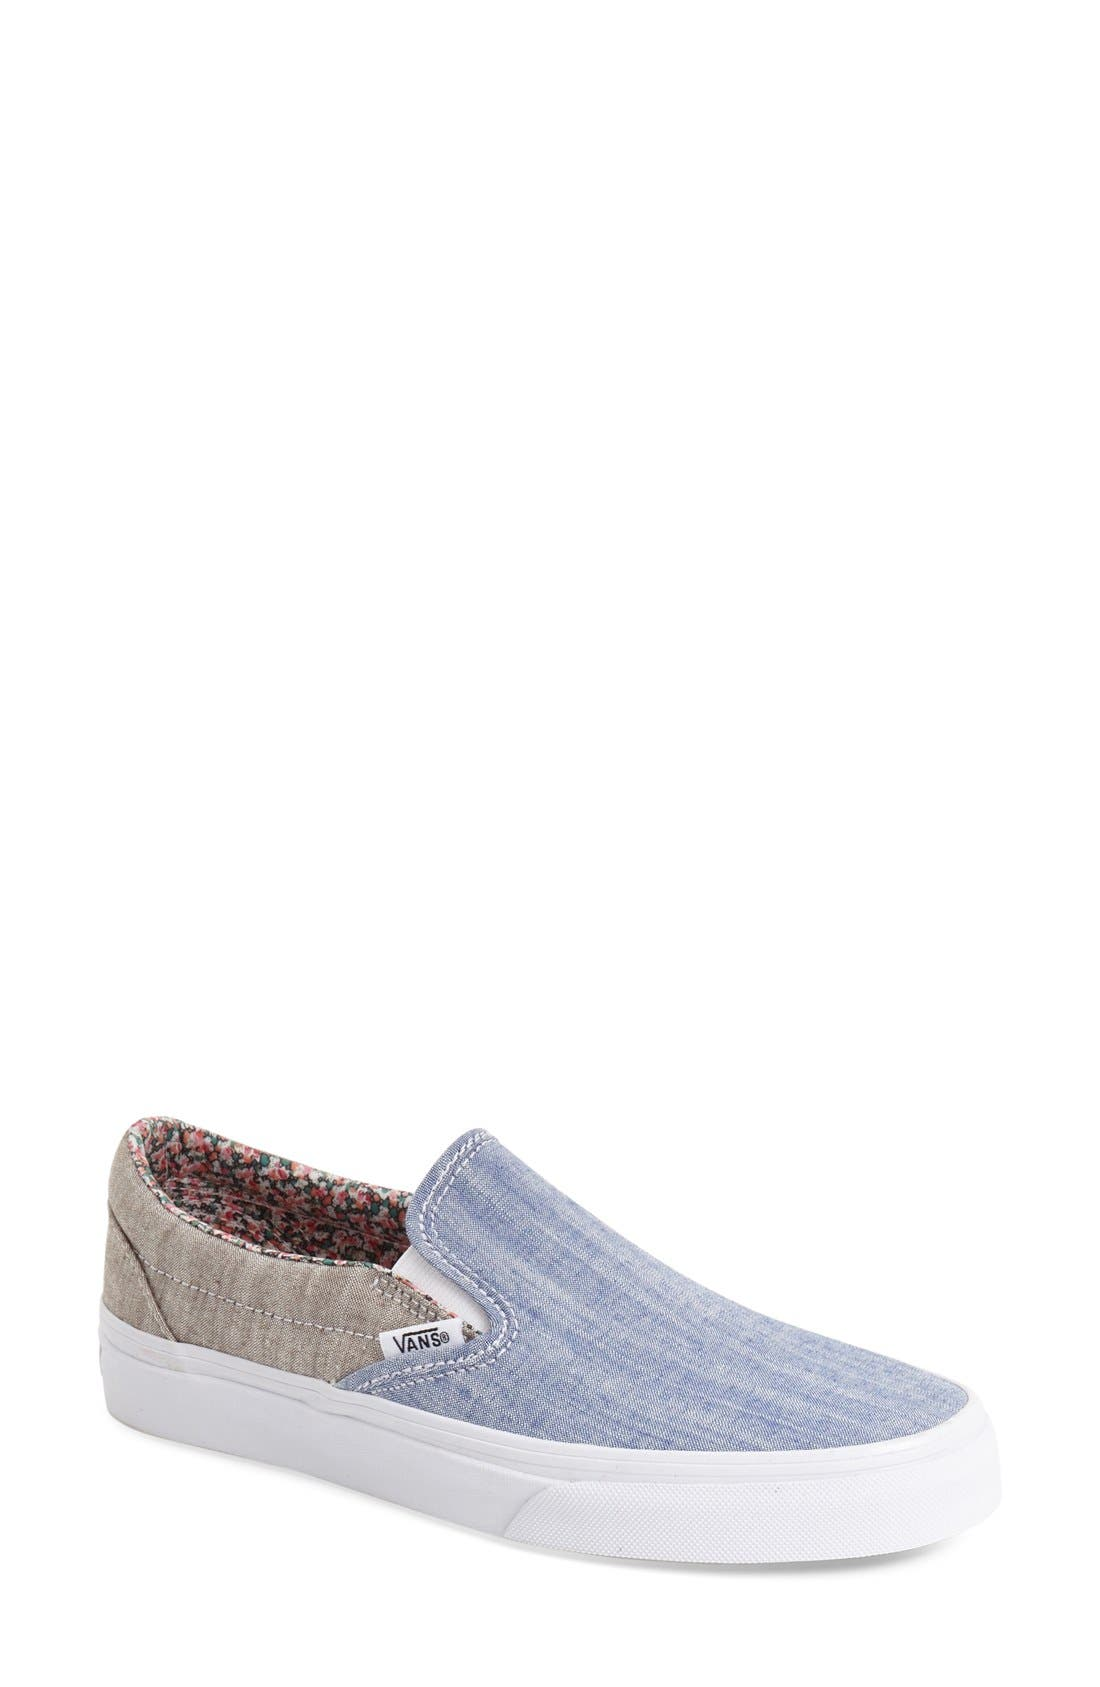 ,                             Classic Slip-On Sneaker,                             Main thumbnail 352, color,                             401